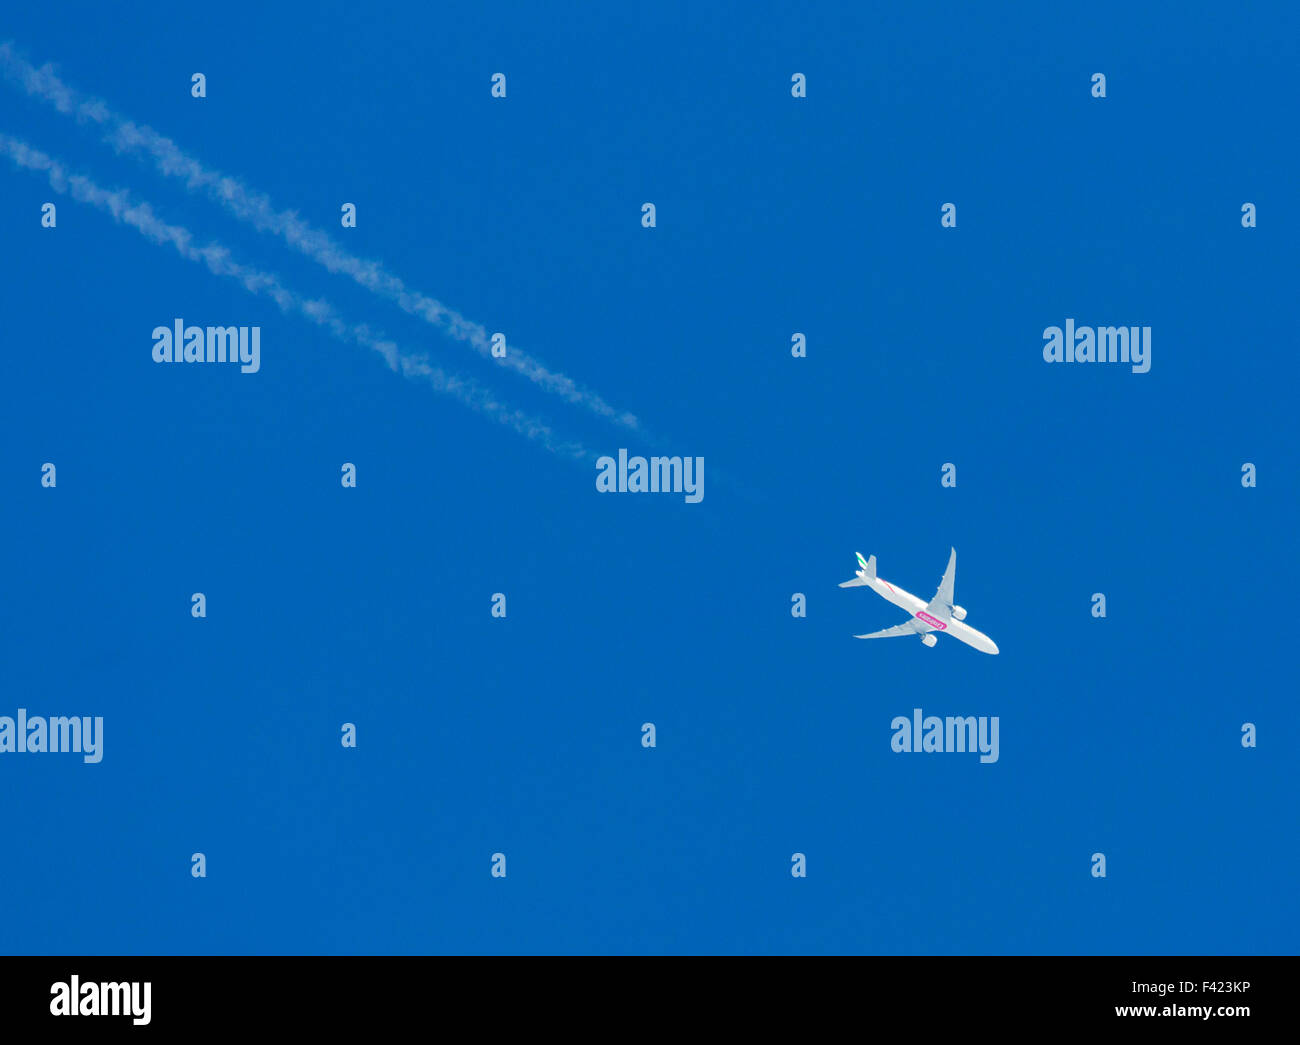 Emirates passenger aircraft flying over the UK - Stock Image